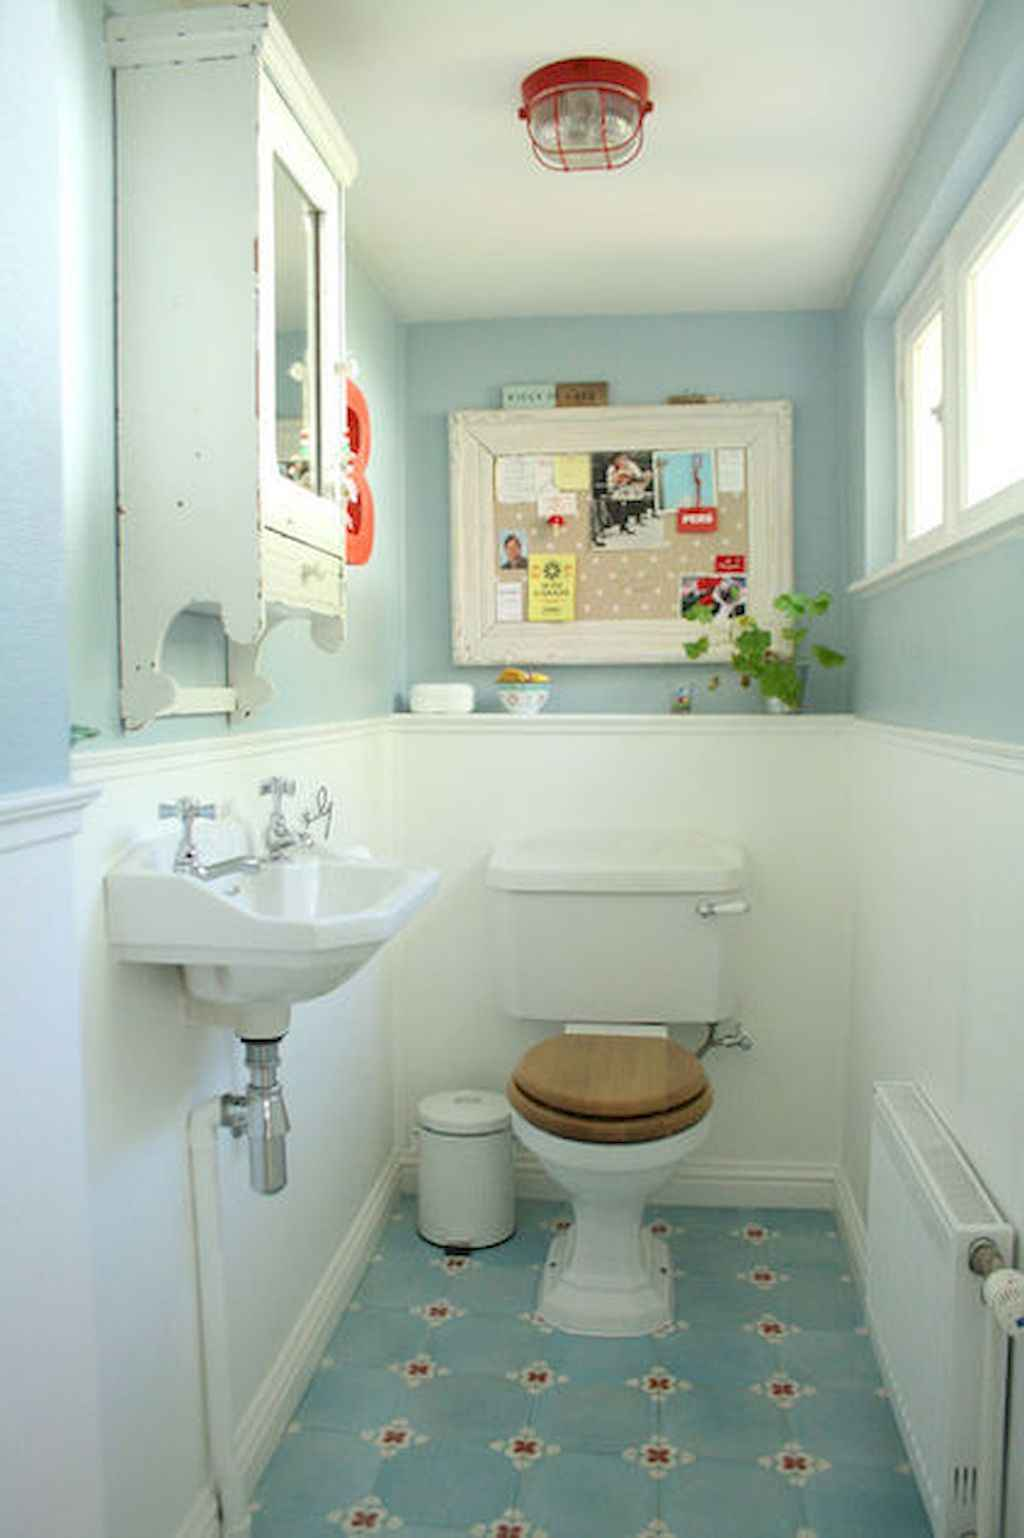 60 trend eclectic bathroom ideas (31)